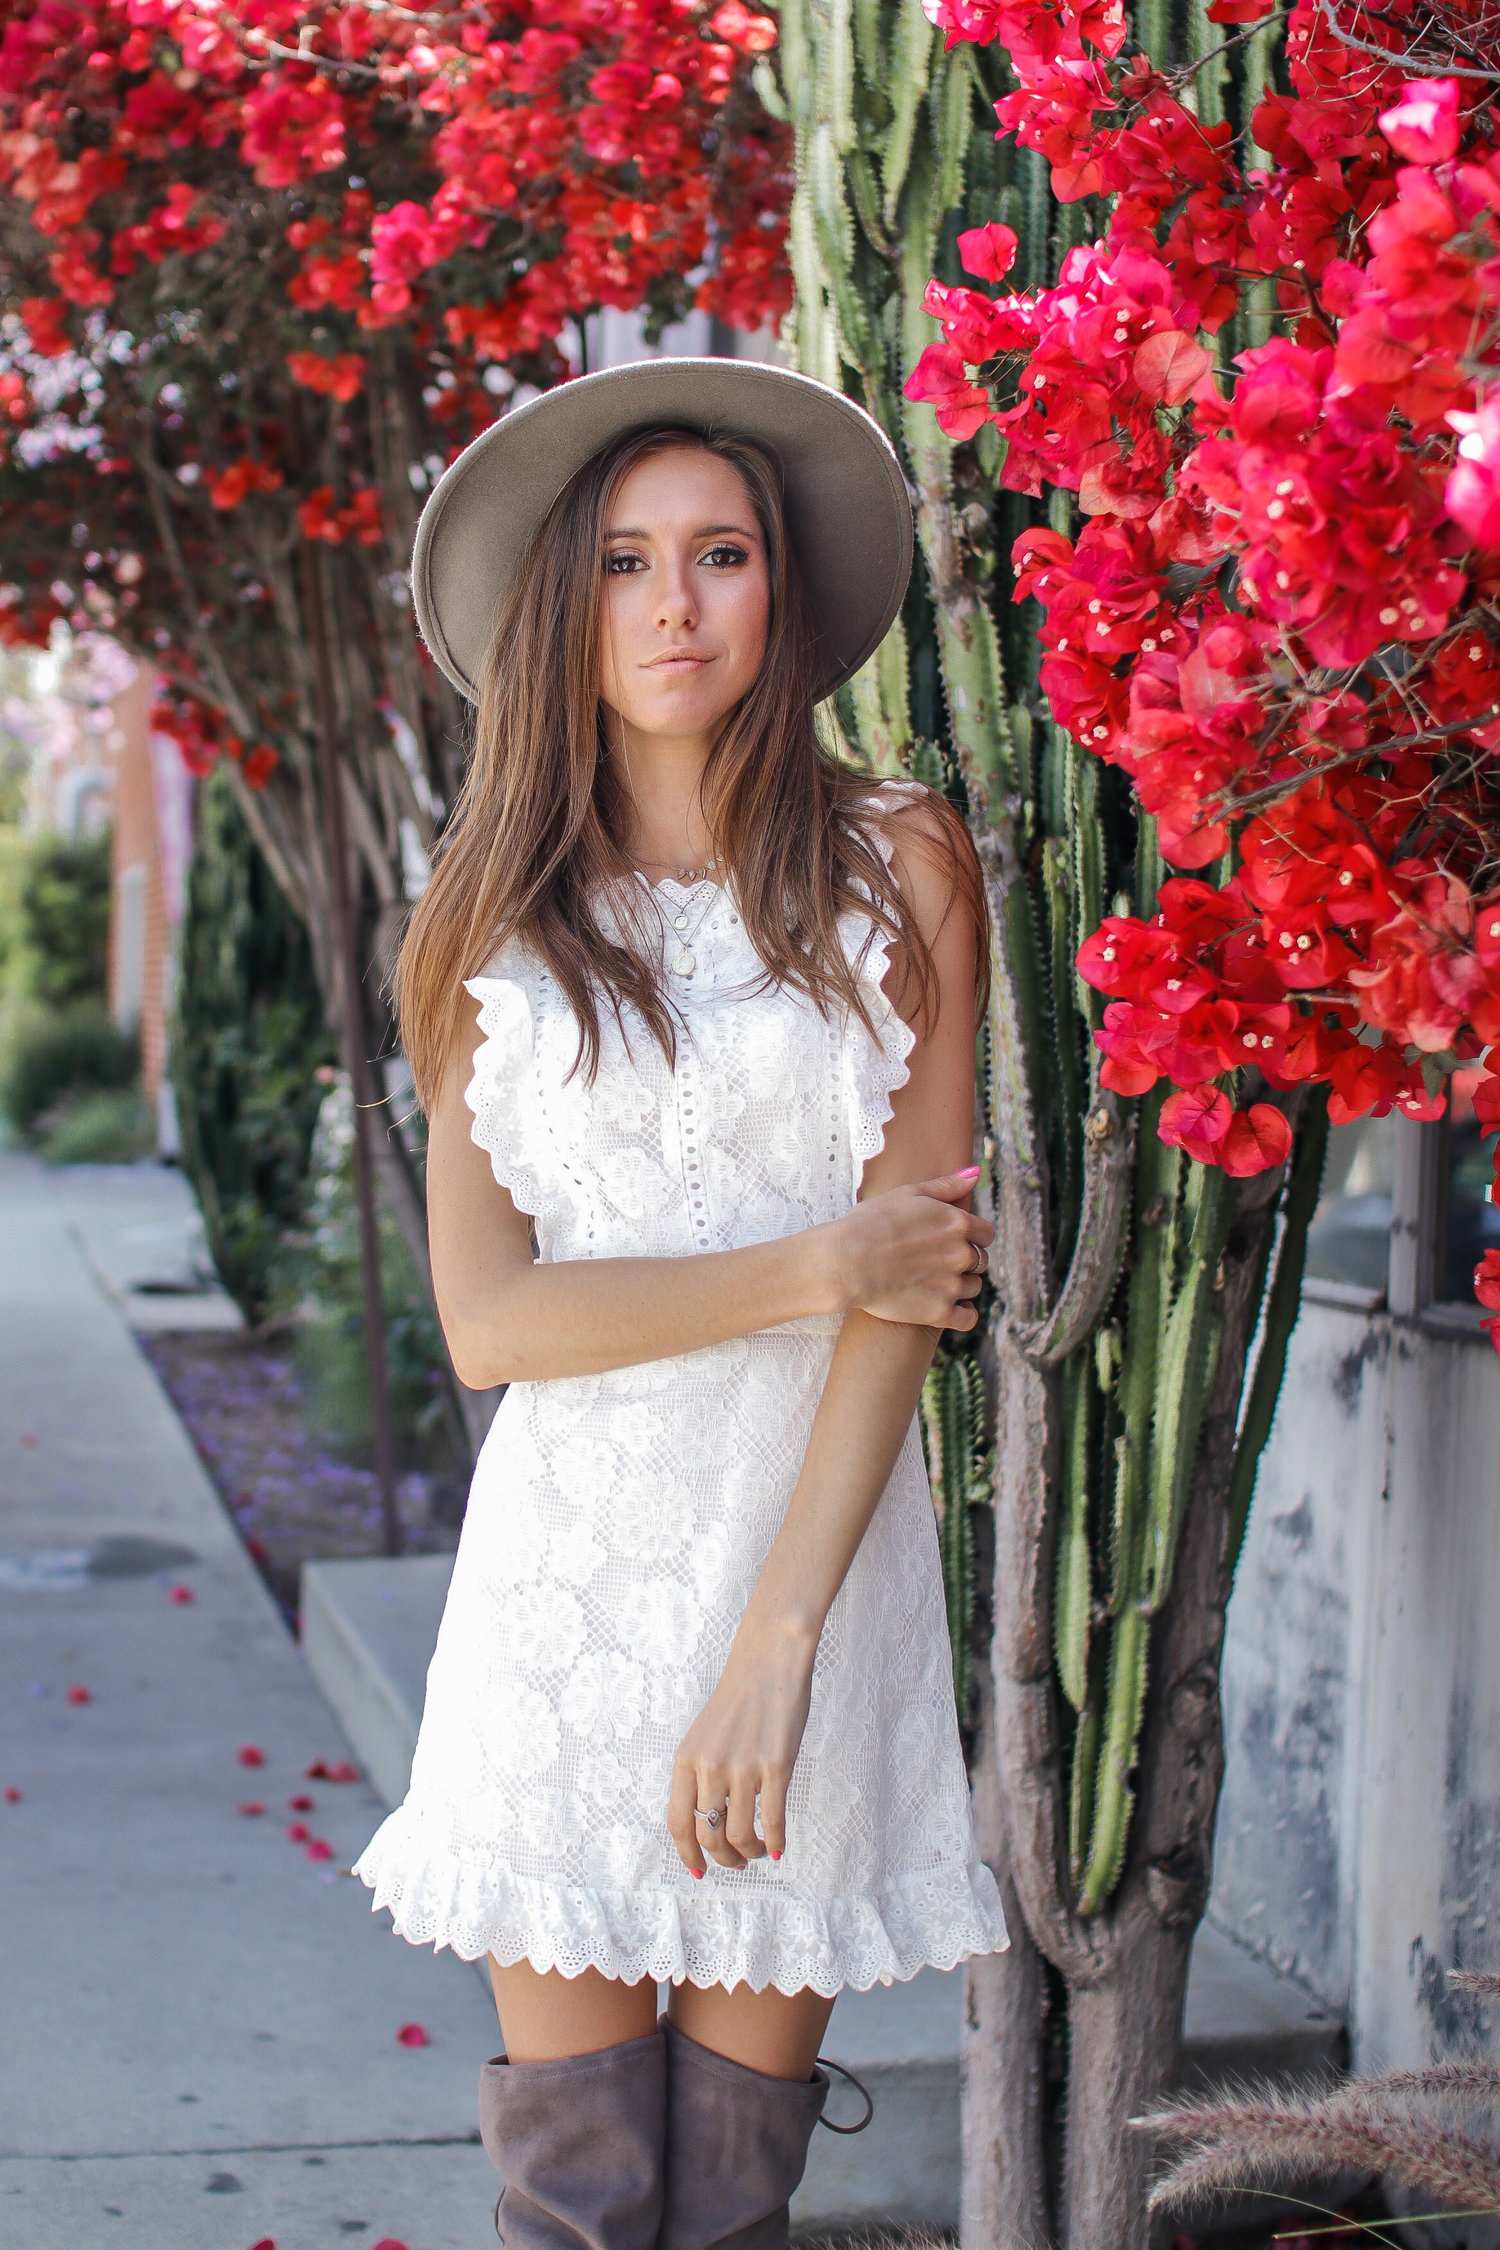 The+Hungarian+Brunette+My+new+favourite+white+lace+apron+dress+(p.s.jpeg